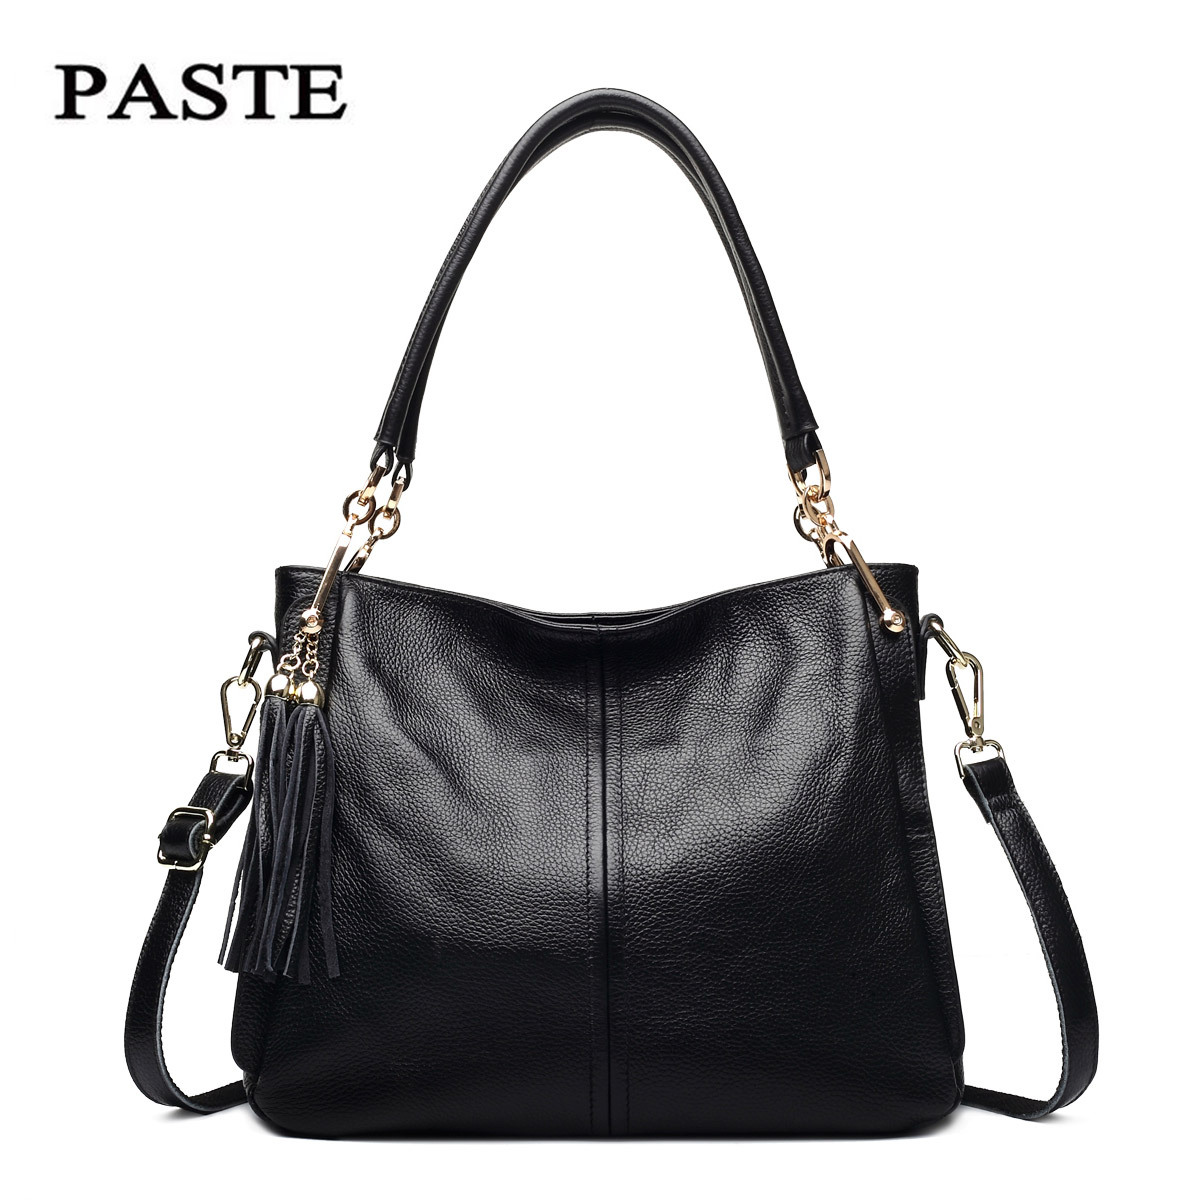 PASTE New Genuine Leather Women Bag Famous Brand Handbags For Women 2018 Tote Bags Big Ladies Crossbody Shoulder Bag BolsosMujer